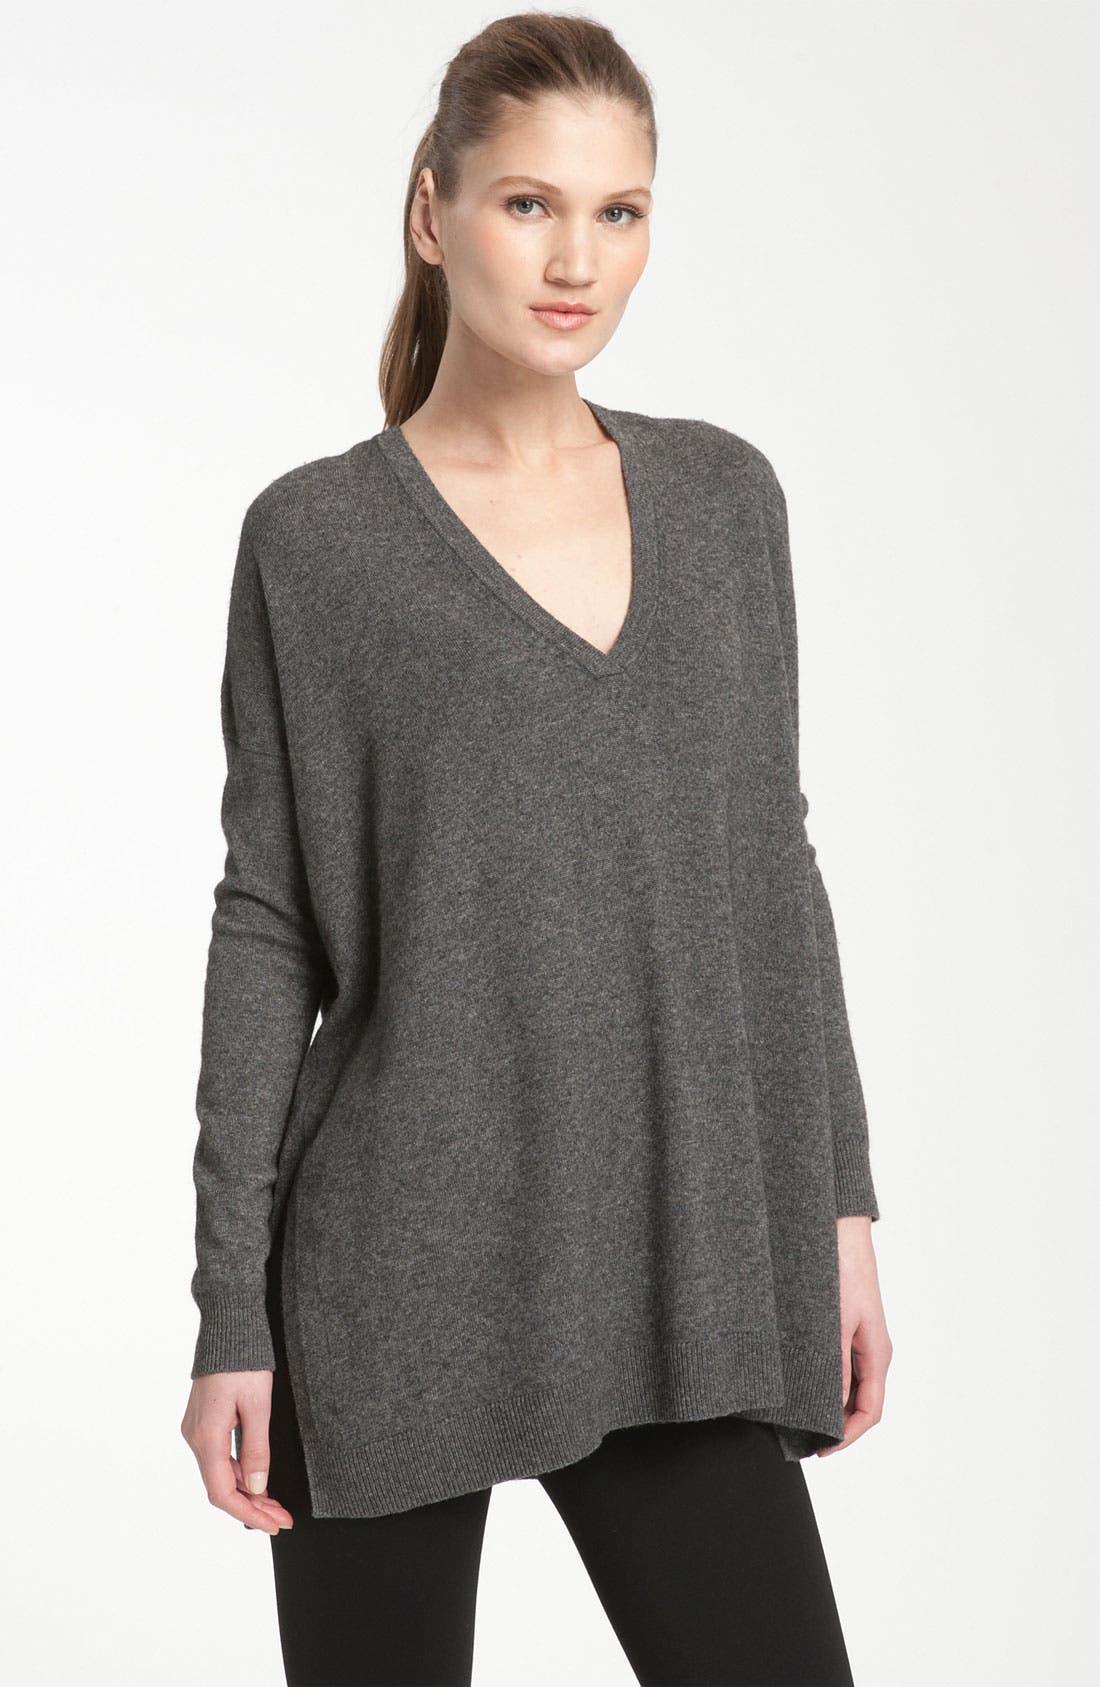 Alternate Image 1 Selected - Vince Boxy Sweater Tunic